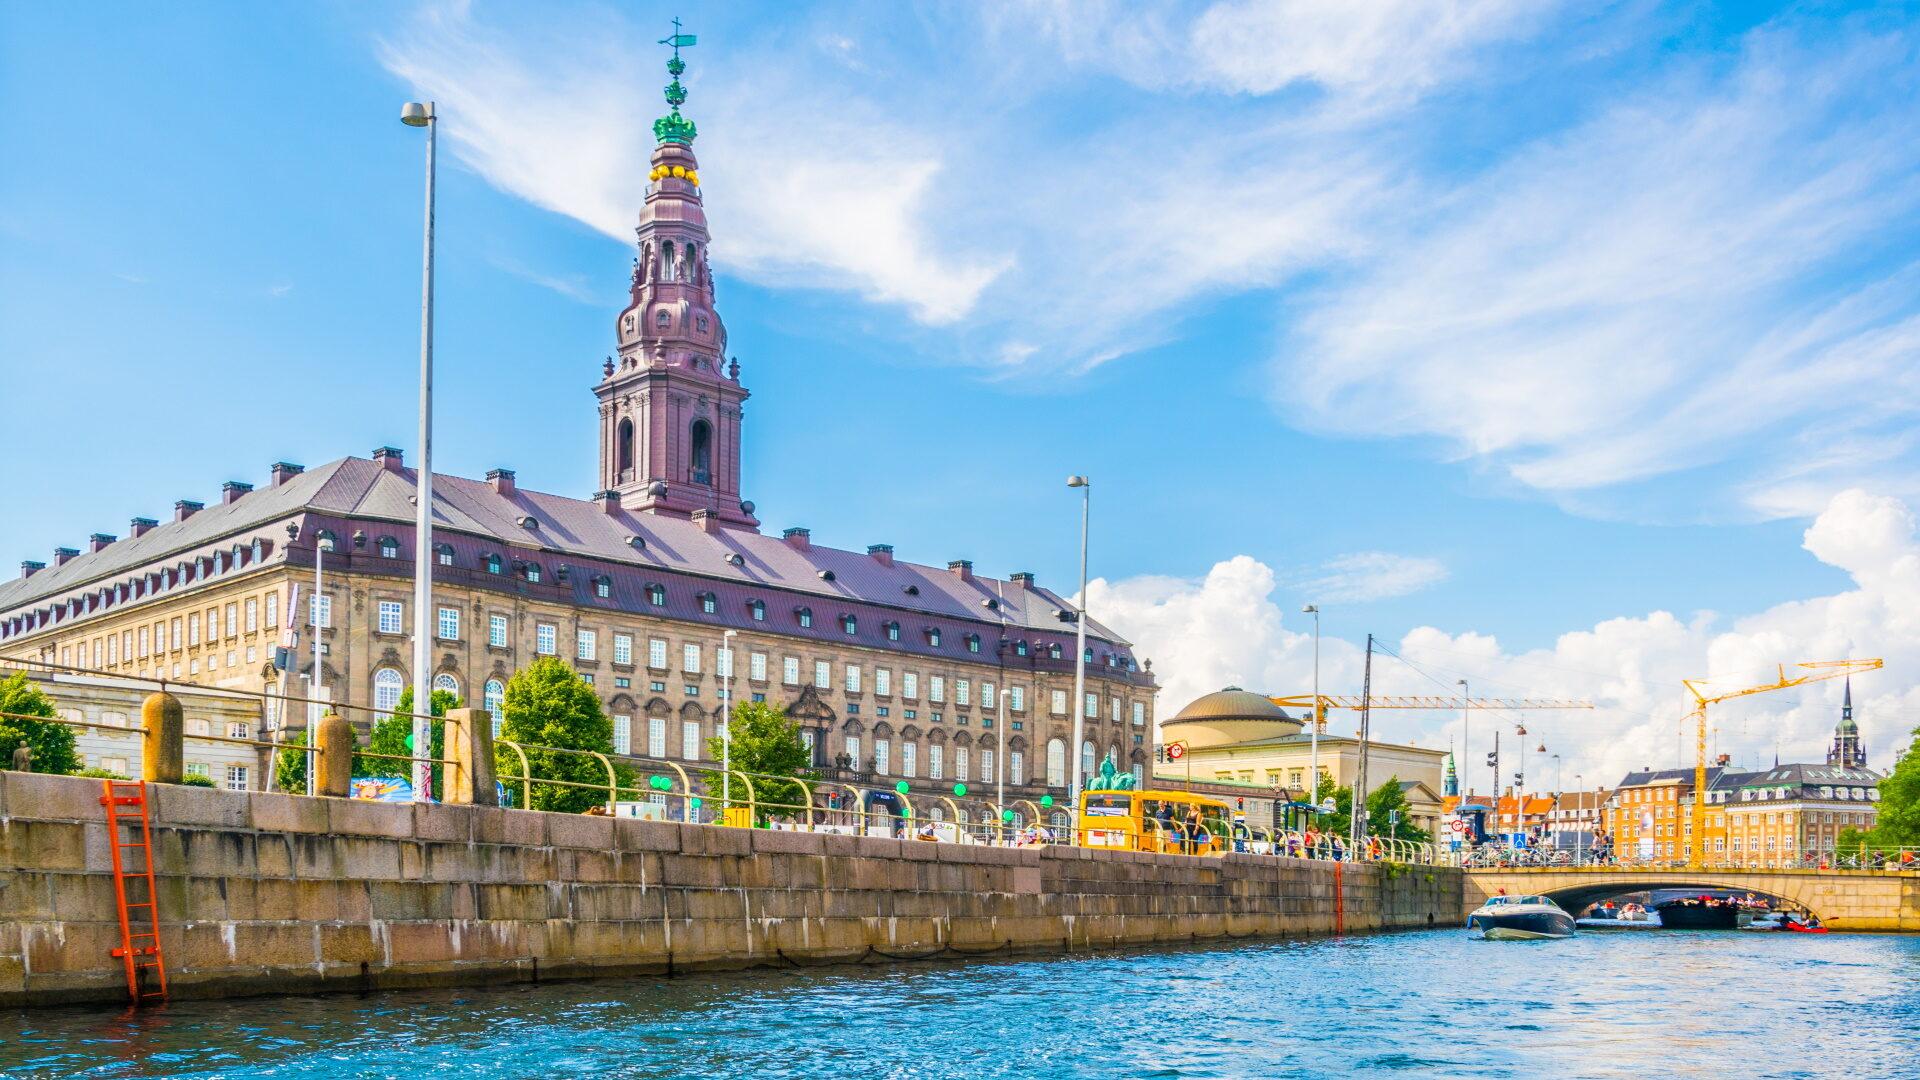 Stuttgart (STR) – Kopenhagen (CPH)